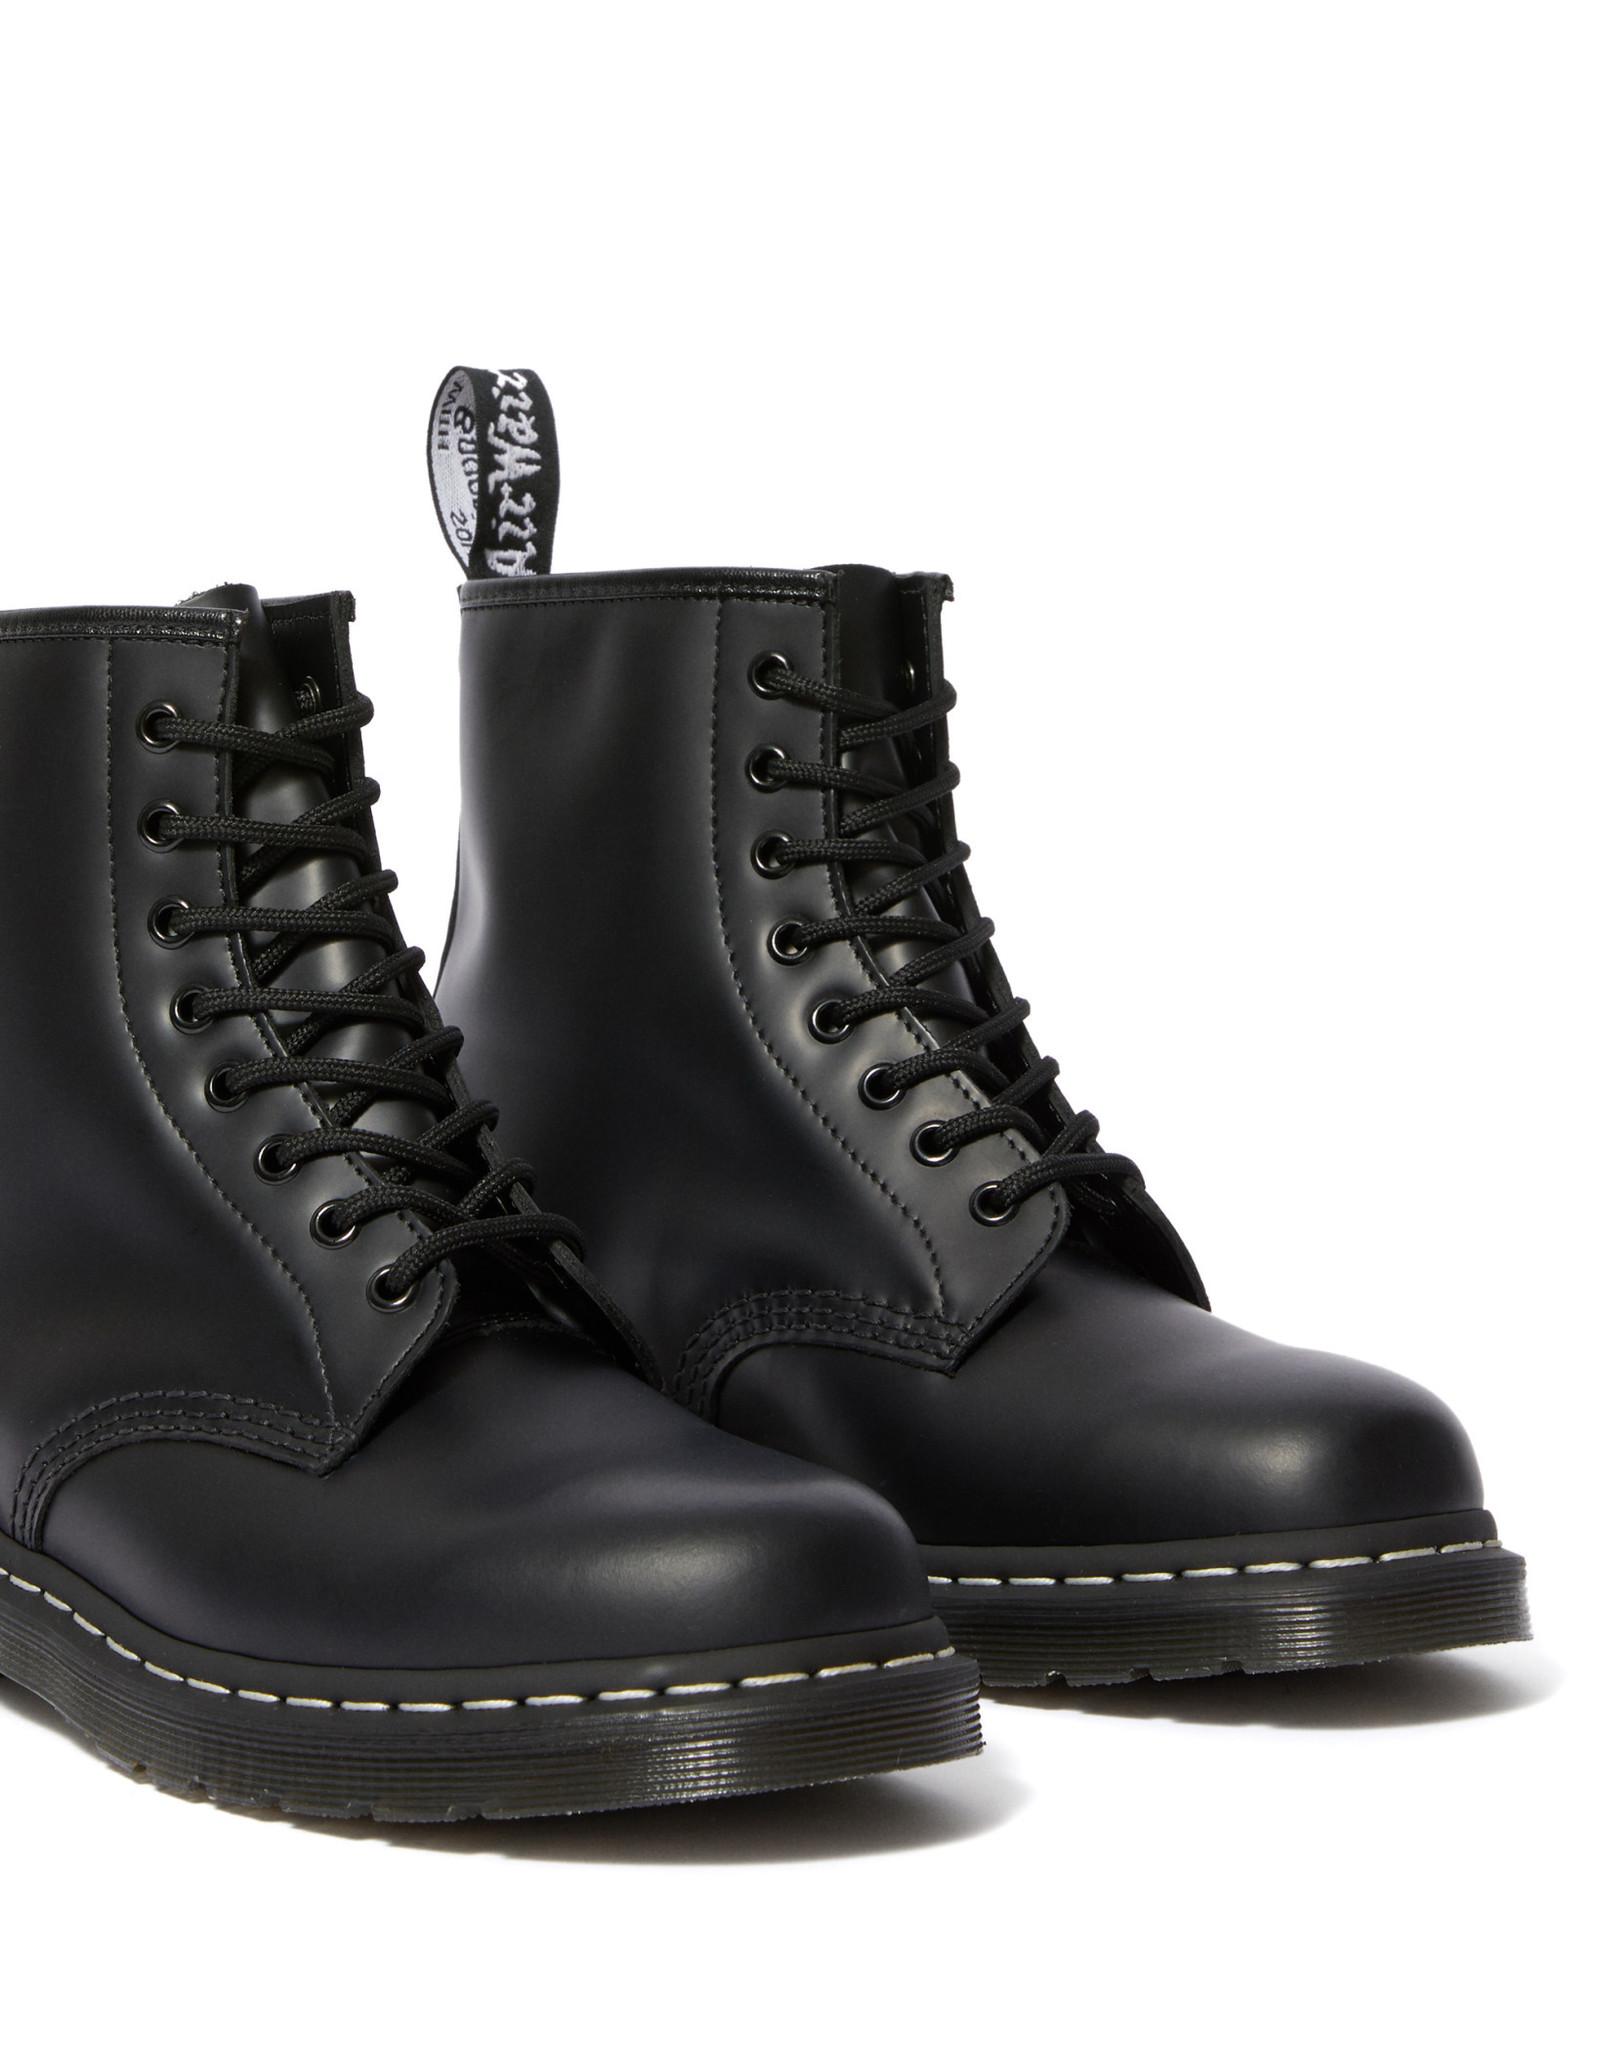 DR. MARTENS 1460 WS BLACK SMOOTH 815BWS-R24758001